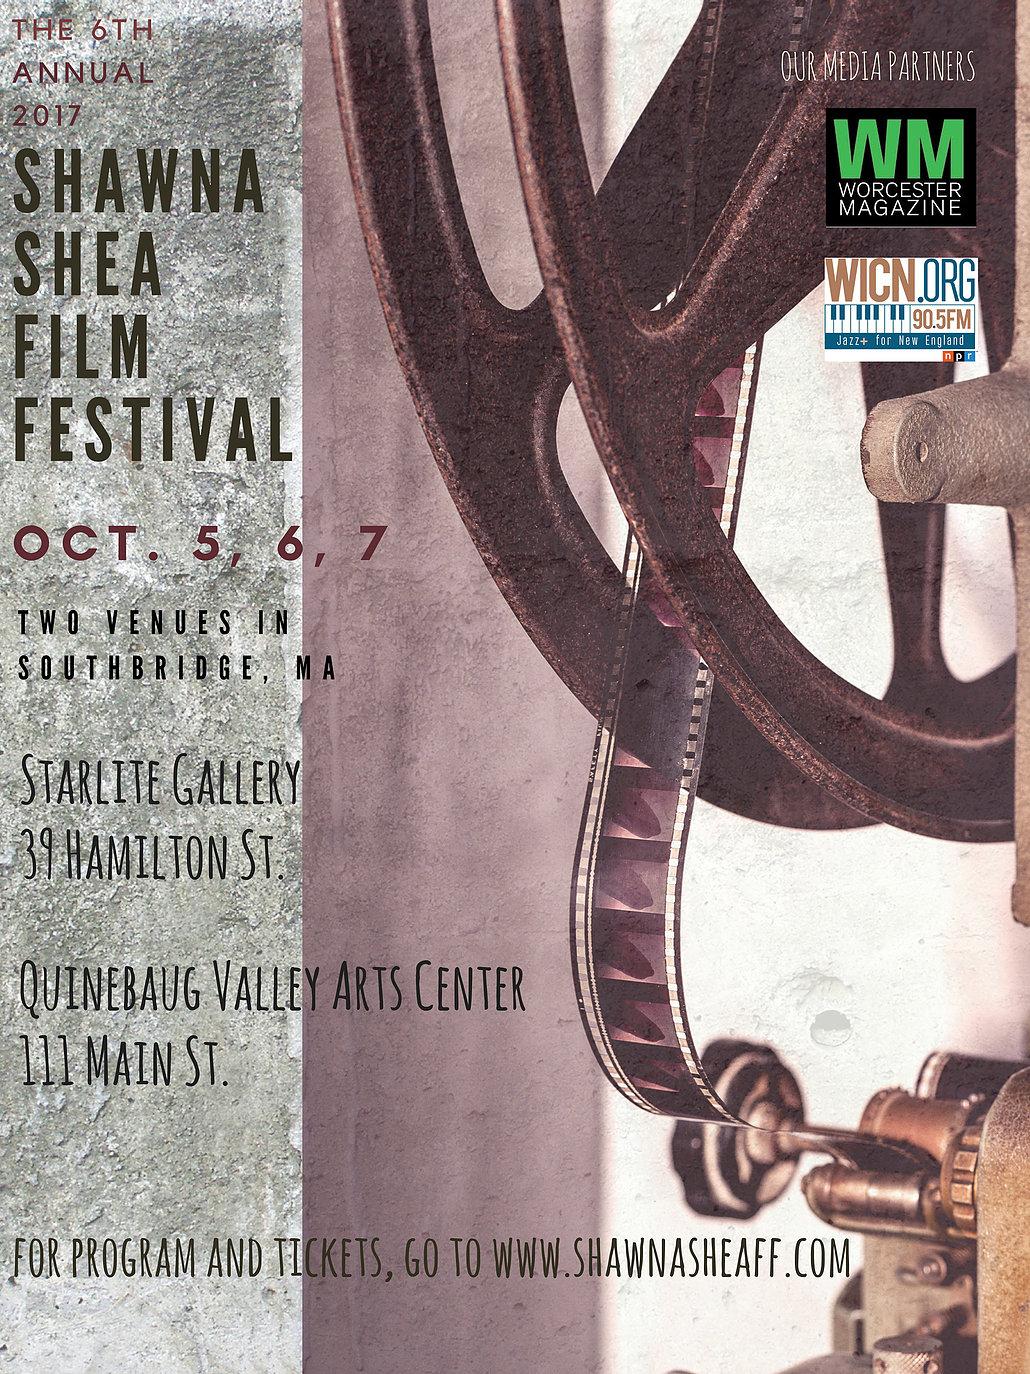 Shawna Shea Memorial Film Festival 2017 in Southbridge, MA presents short comedy 'Depends' by Geena Matuson @geenamatuson #thegirlmirage